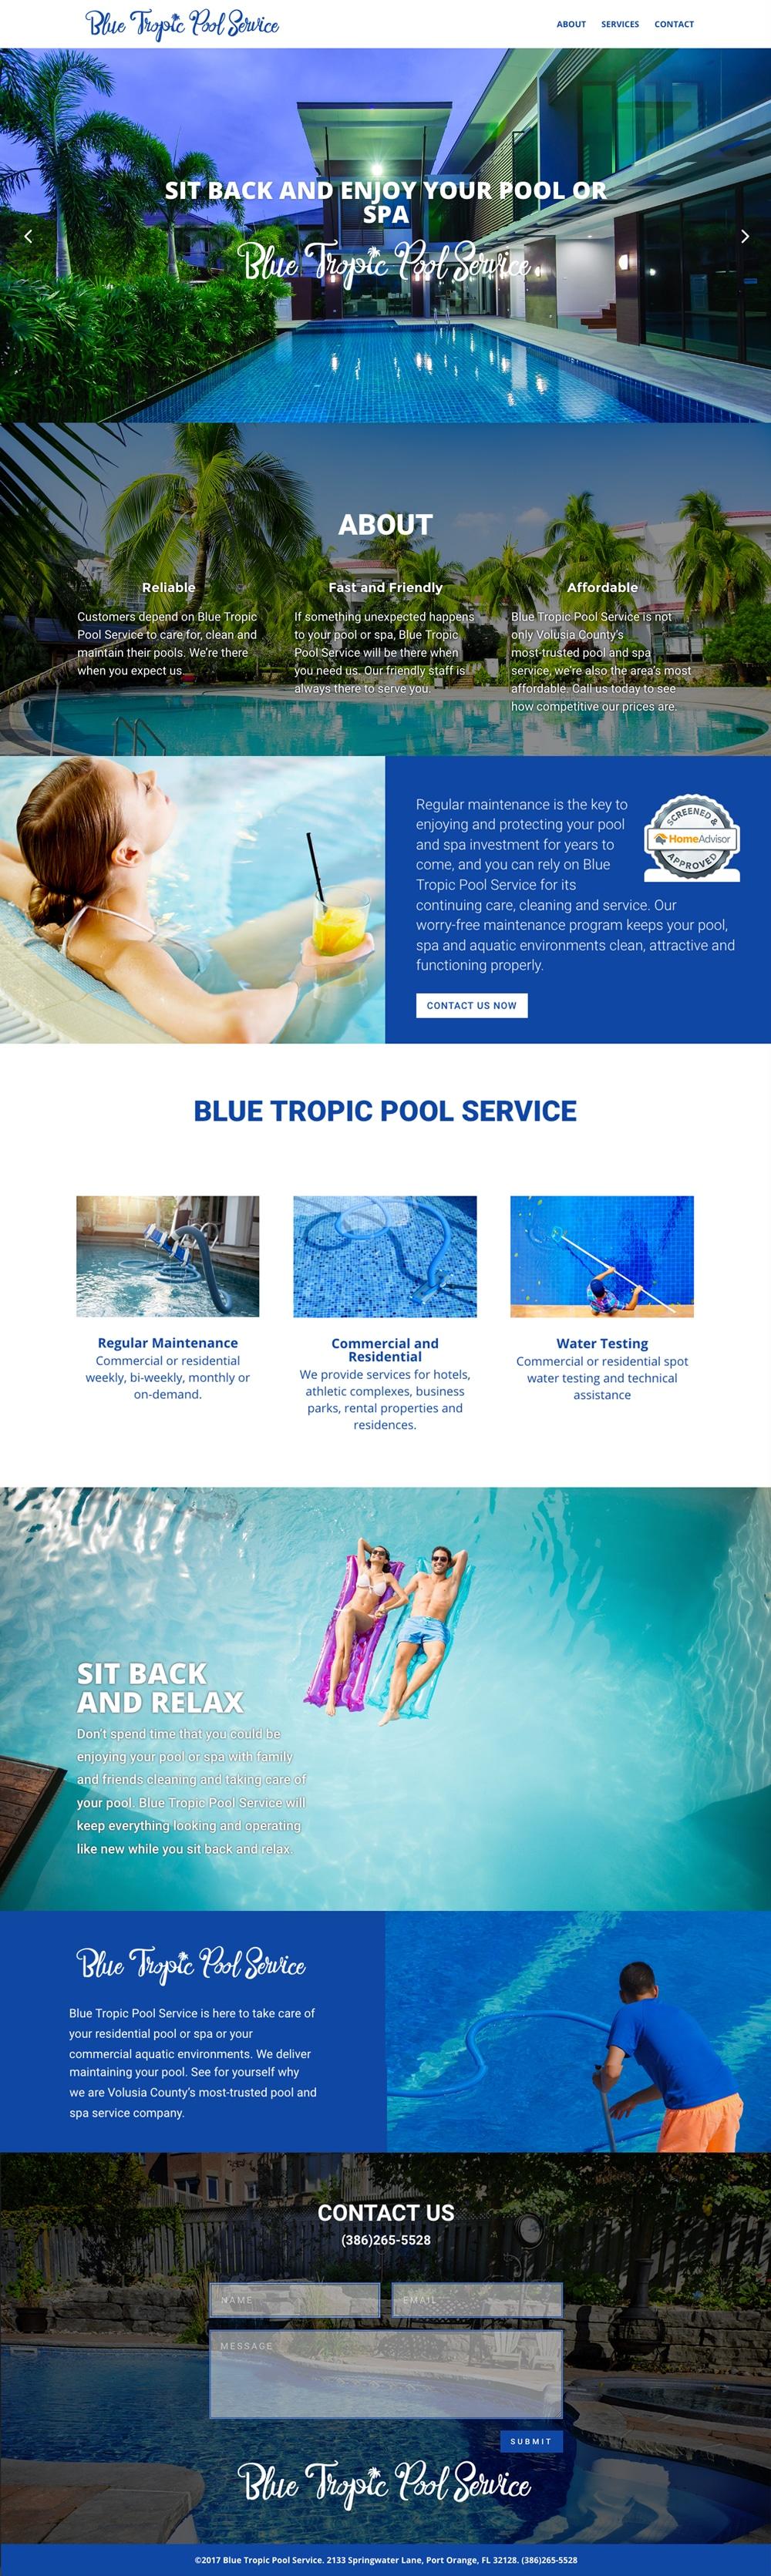 bluetropicpoolservice